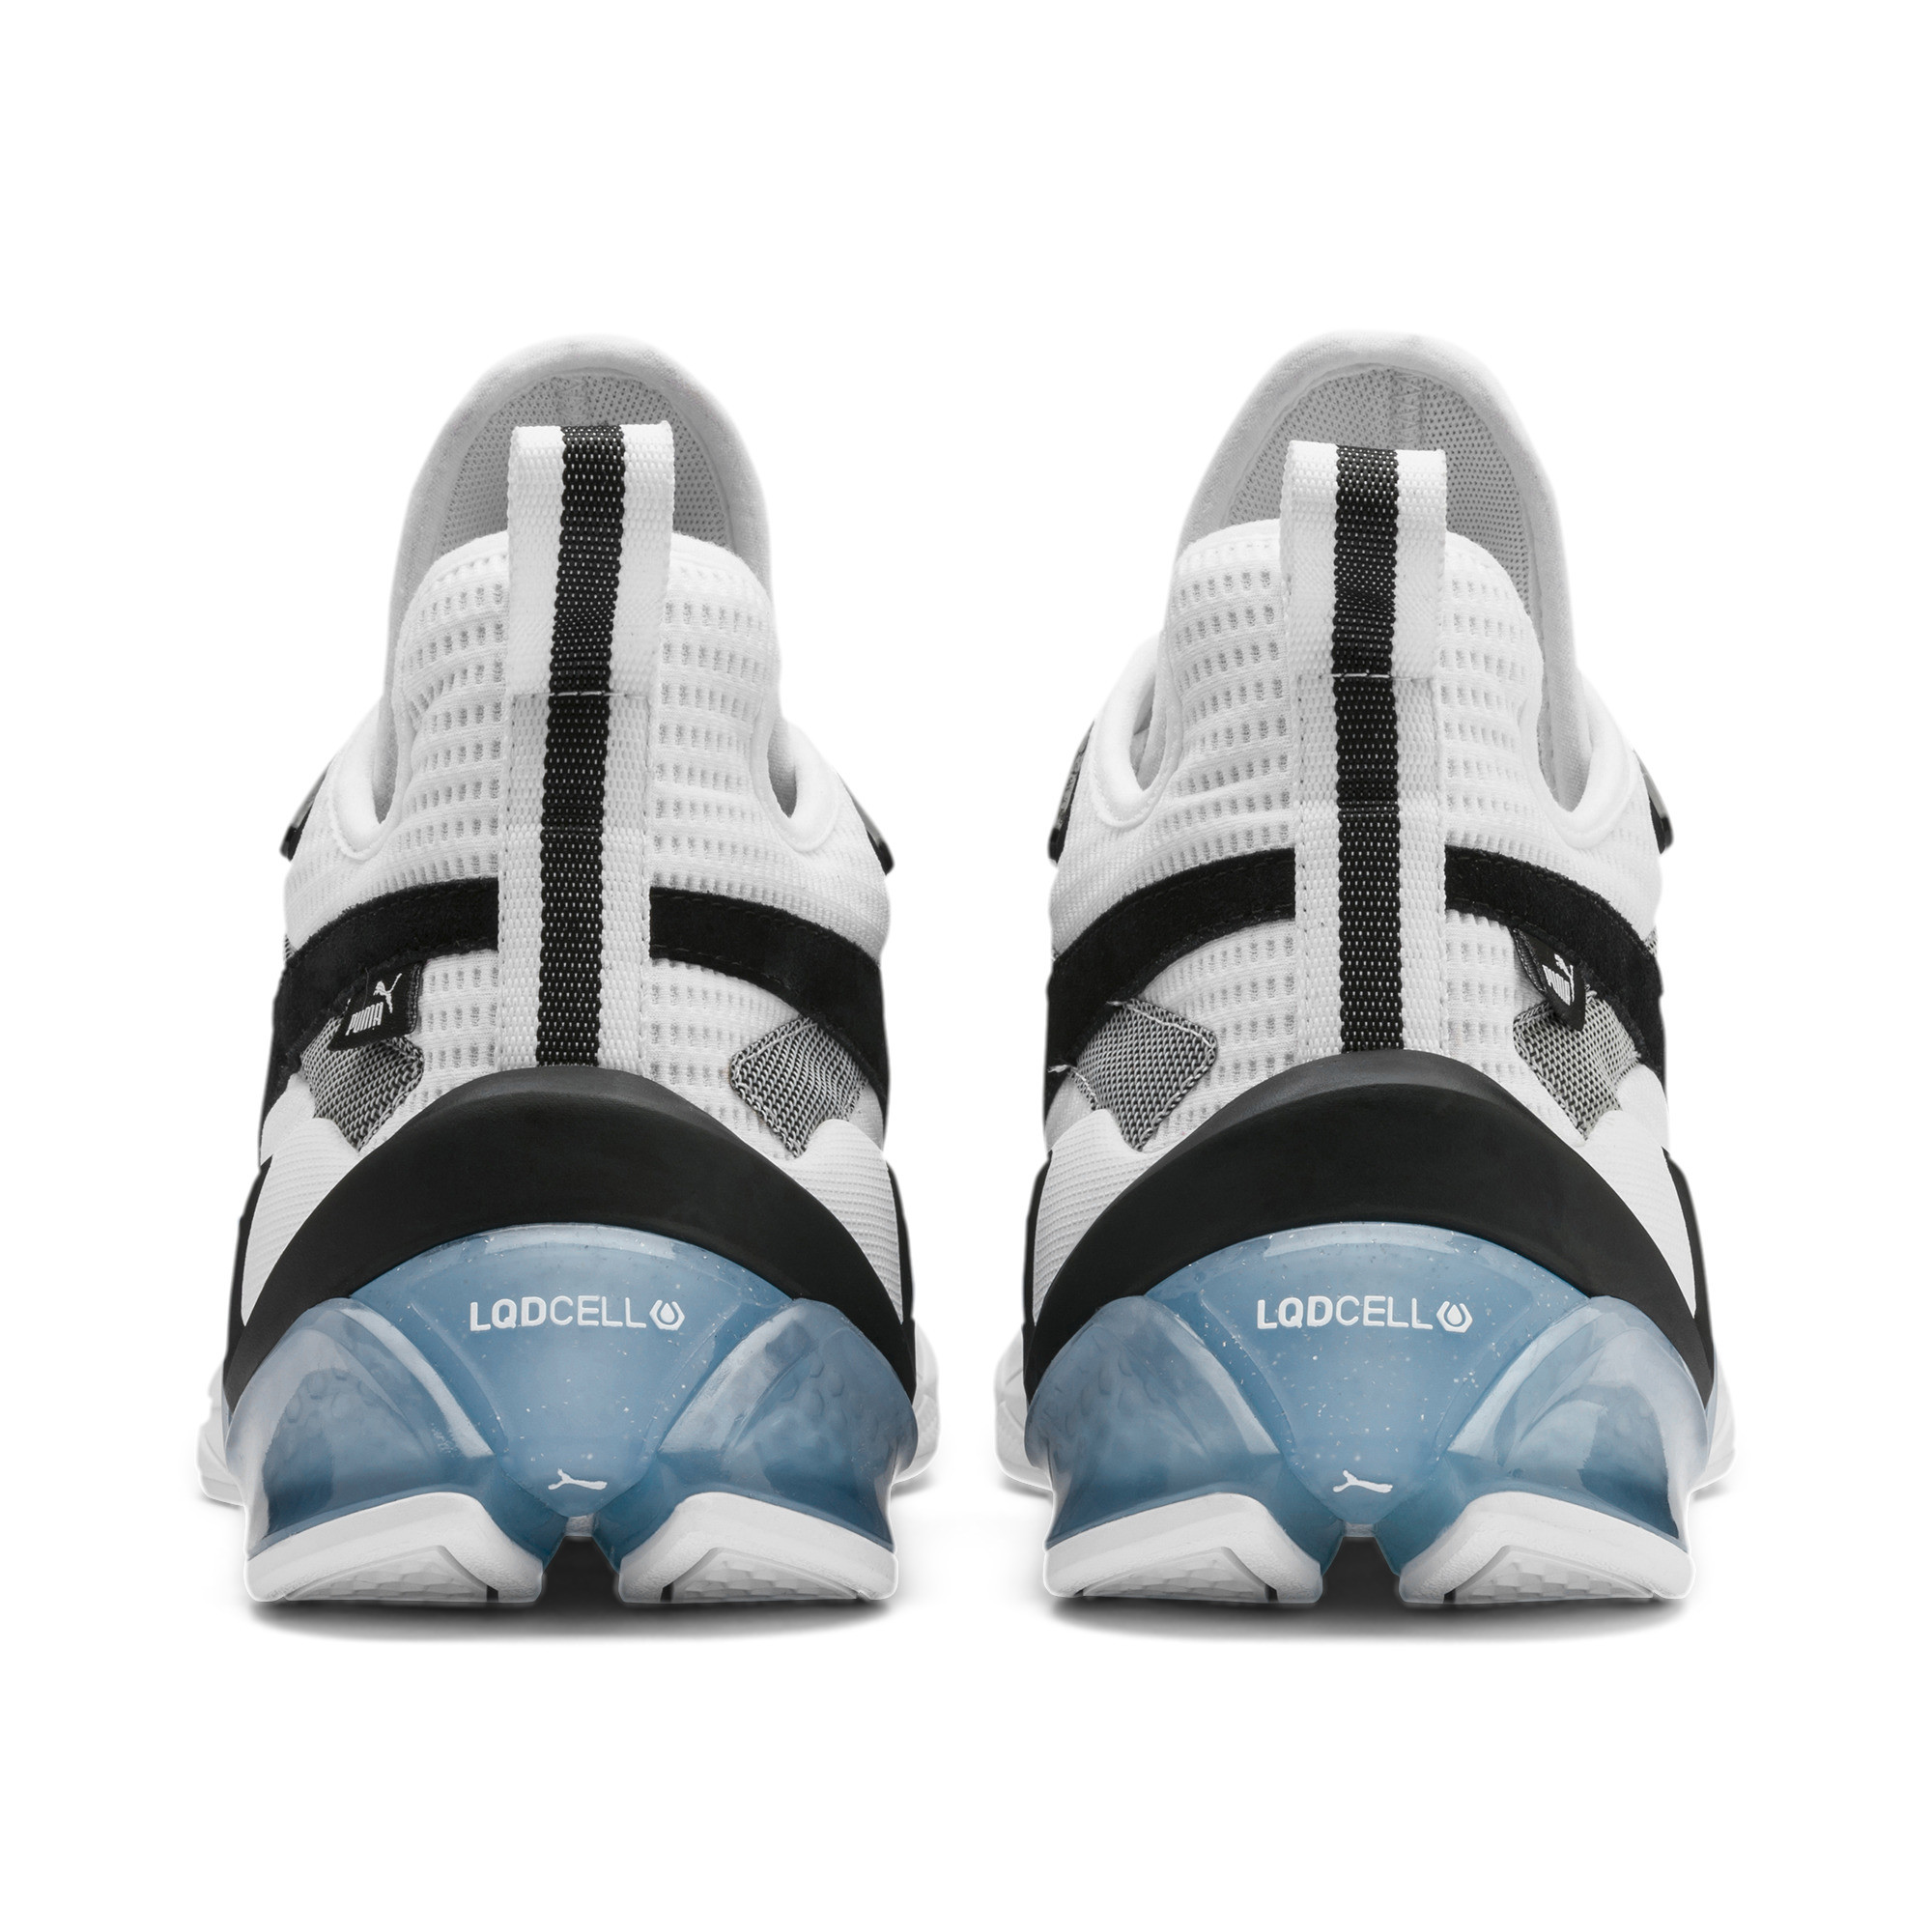 PUMA-Men-039-s-LQDCELL-Origin-Training-Shoes thumbnail 11